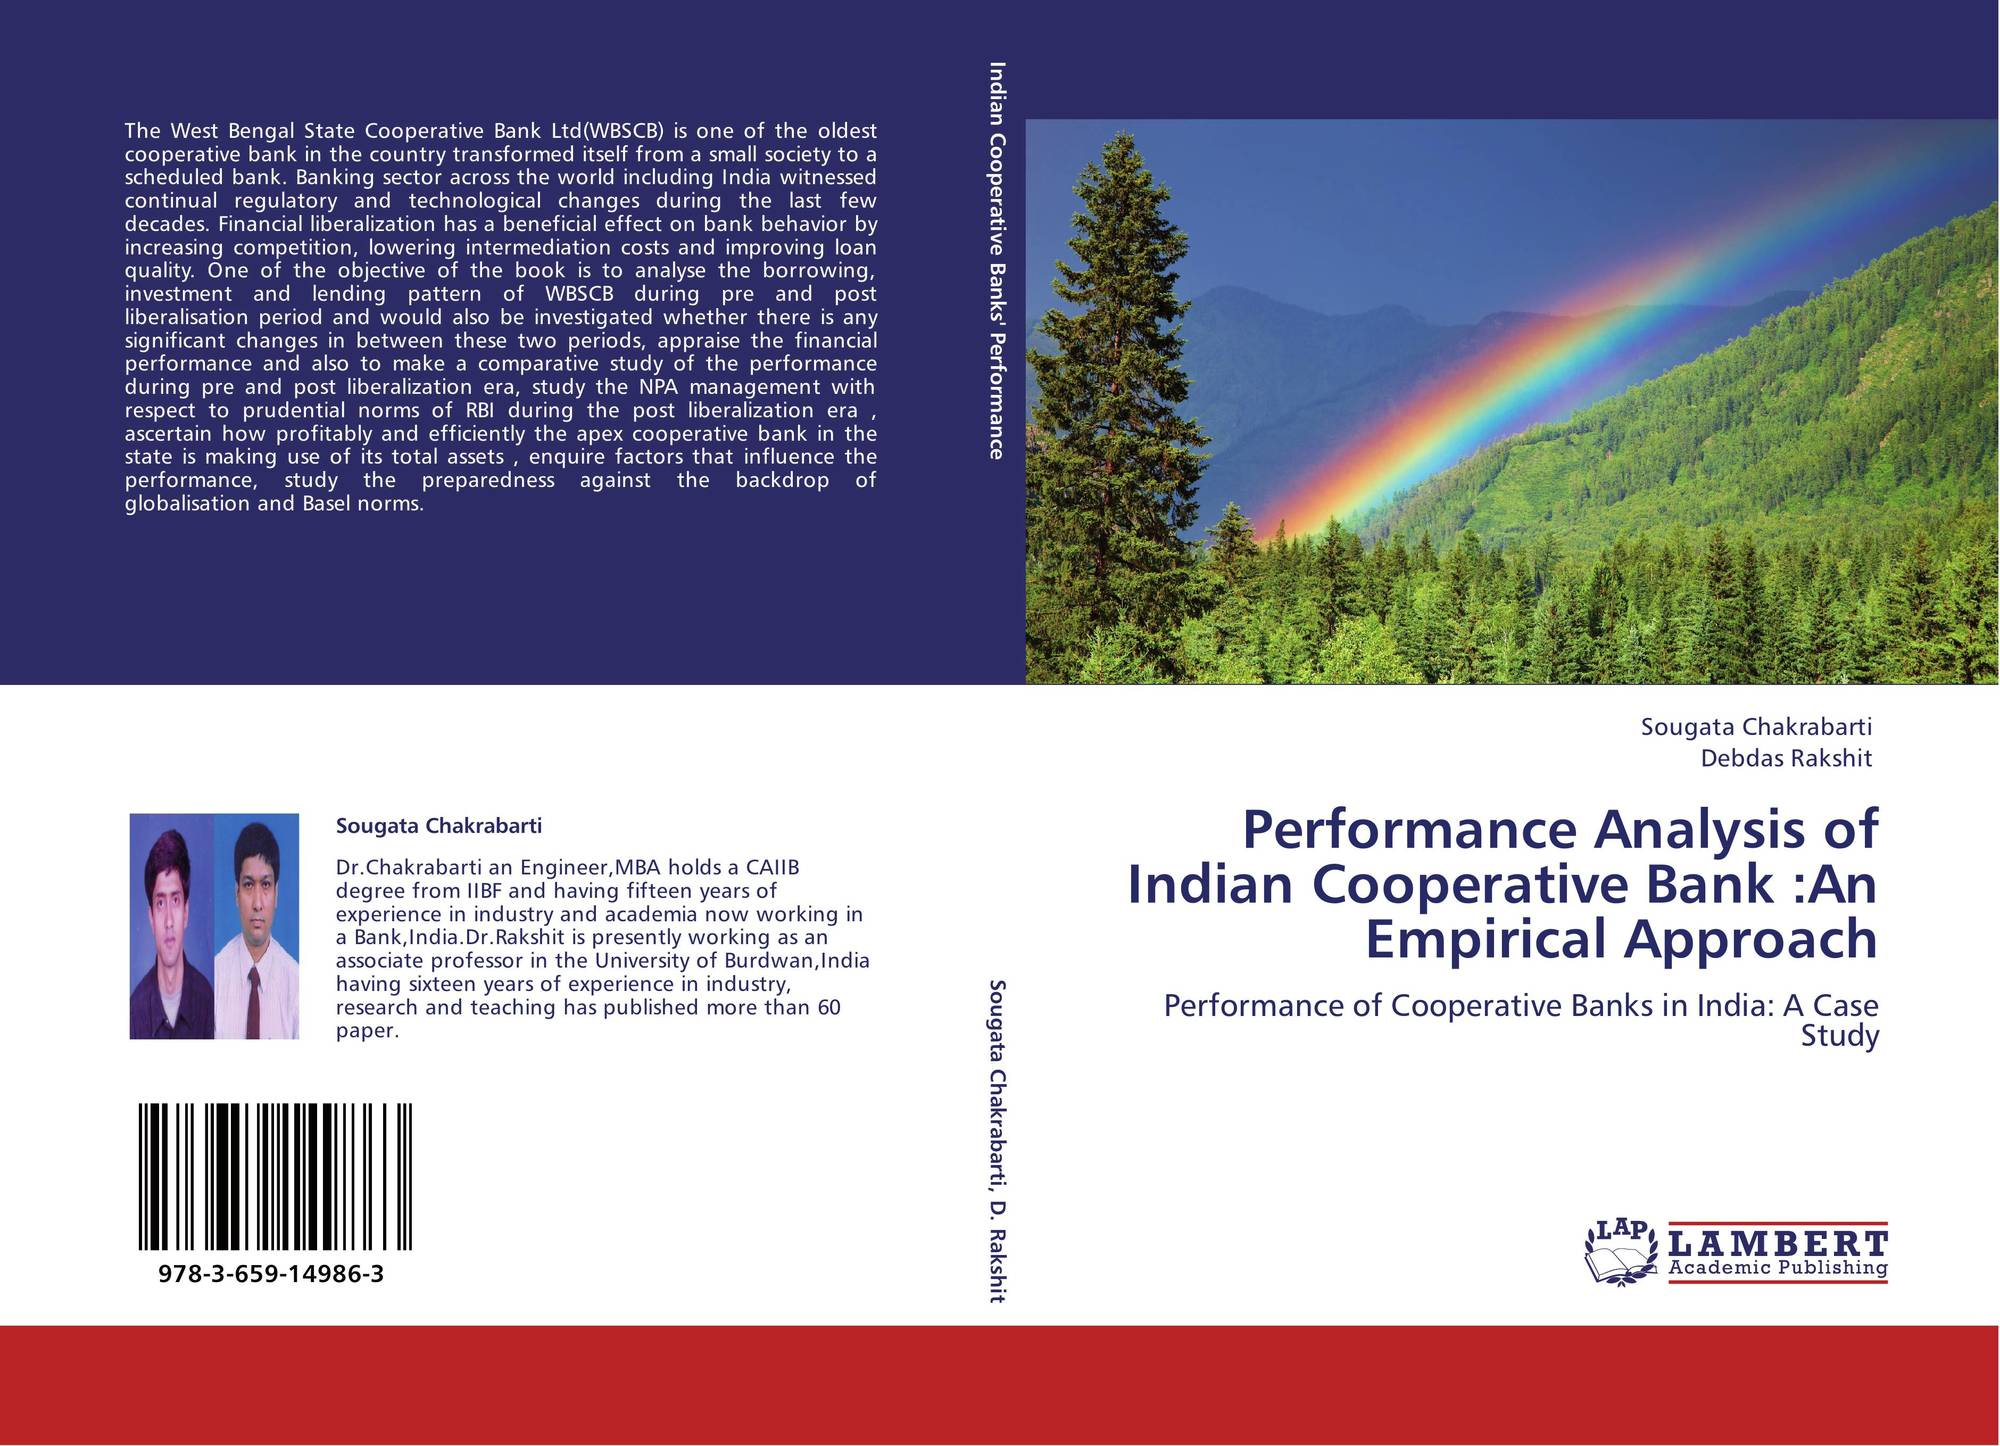 comparative analysis of indian banks performance Analysis of financial performance of banks in india jeevan jayant nagarkar e-mail: jeevannagarkar@siibacin abstract business cycles.